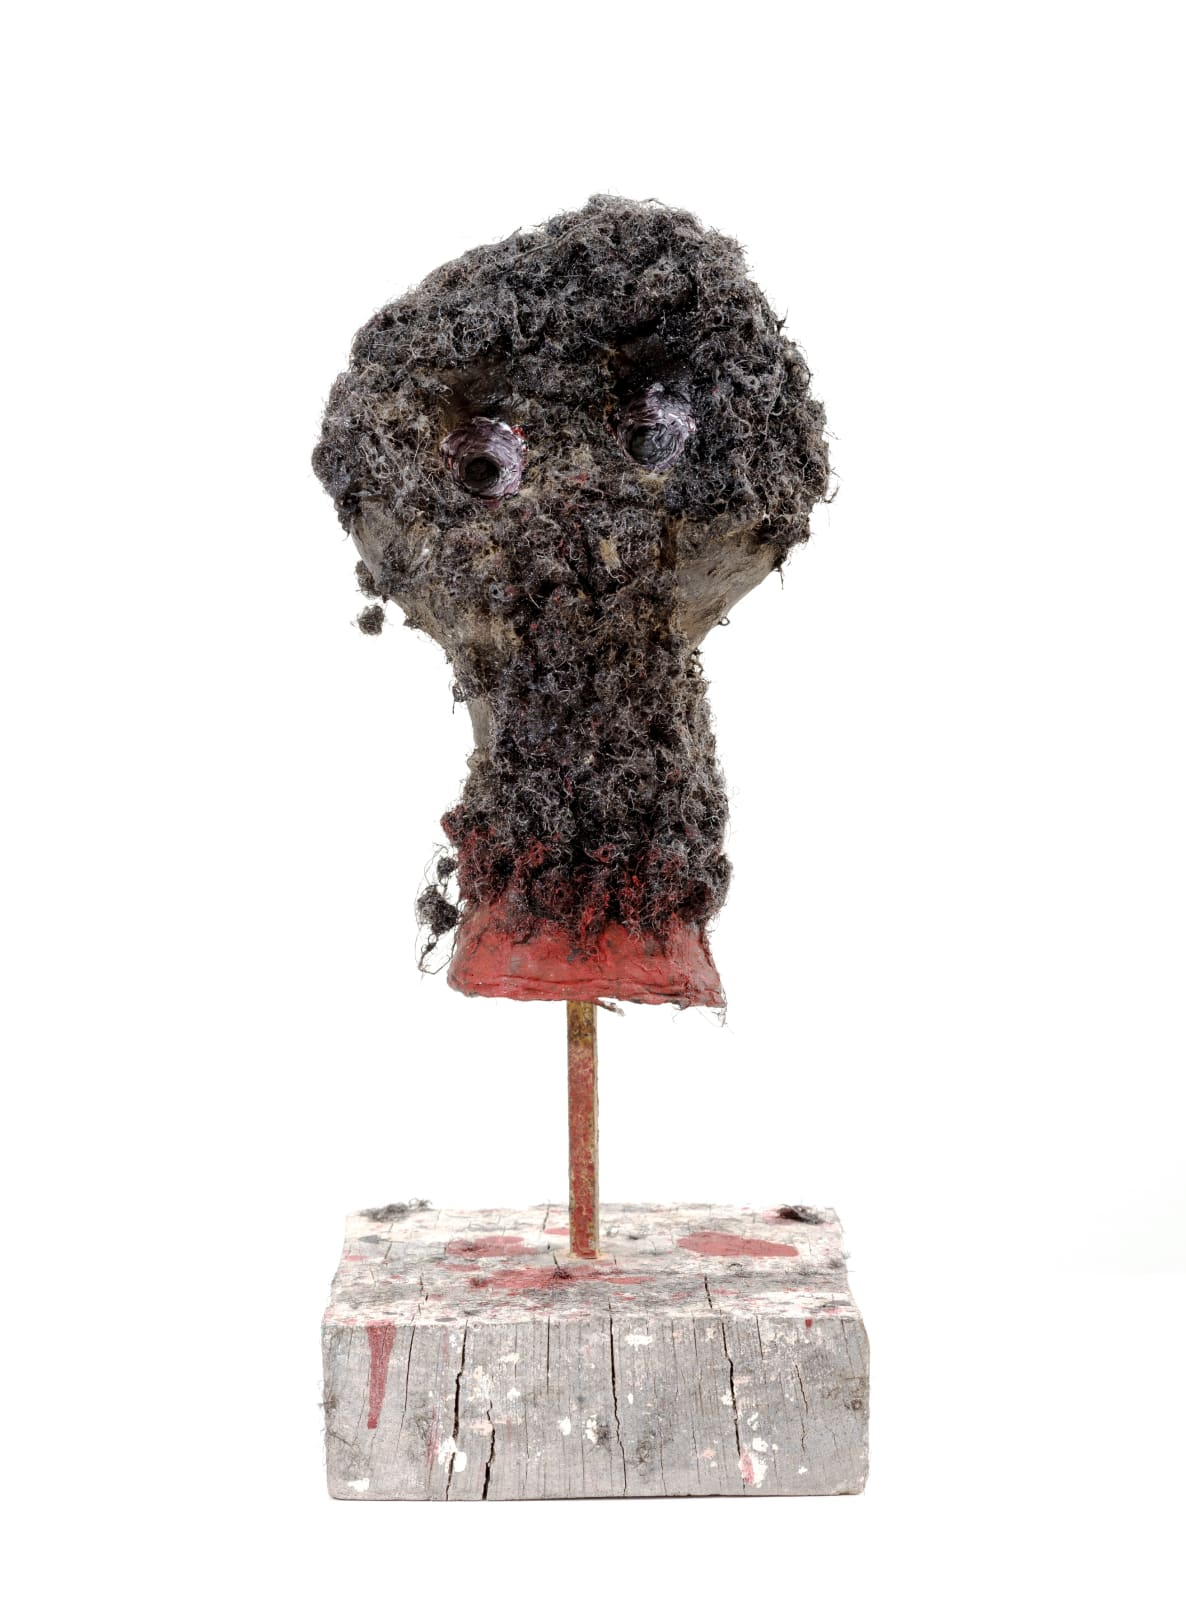 Adjani Okpu-Egbe A French Soldier 's Trophy Head in Cameroo, 2019